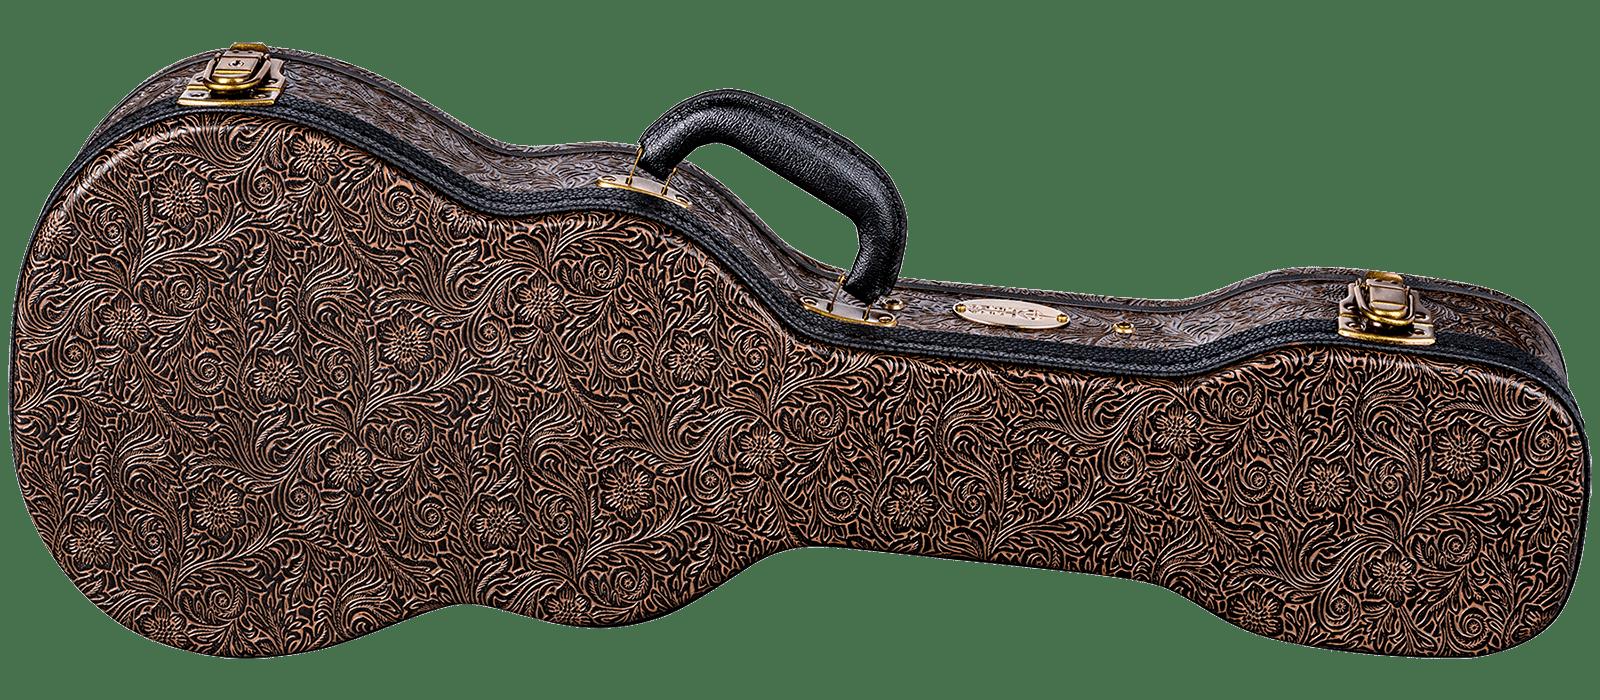 Luna Hard Case Tooled Leather Tenor